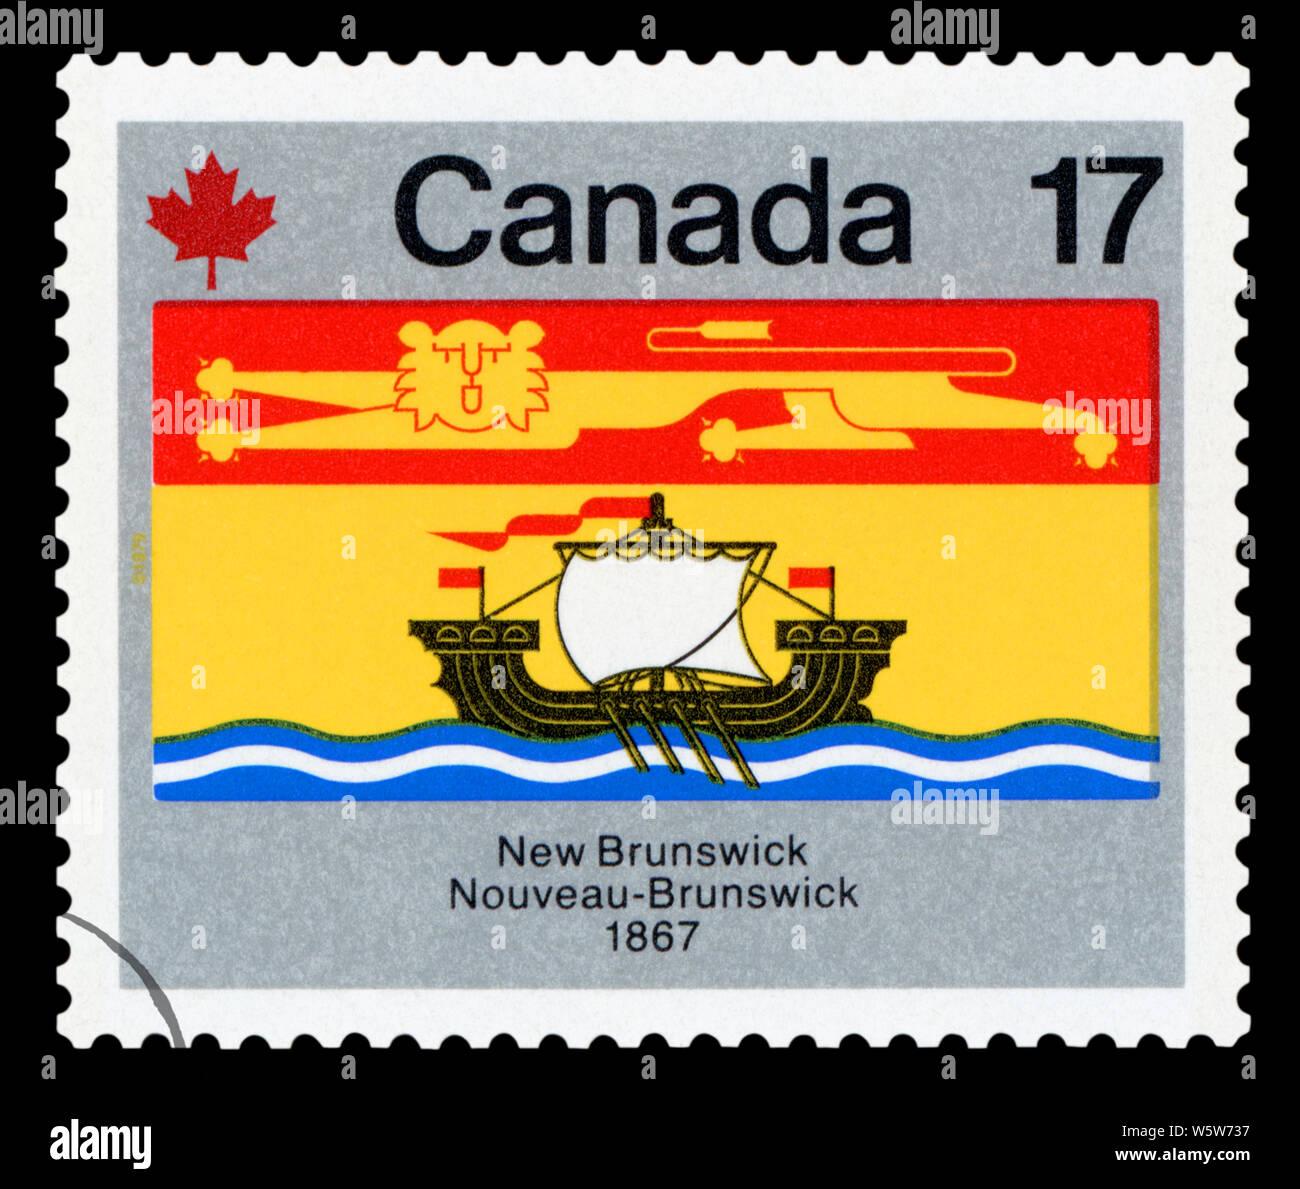 New Brunswick Province Stock Photos & New Brunswick Province